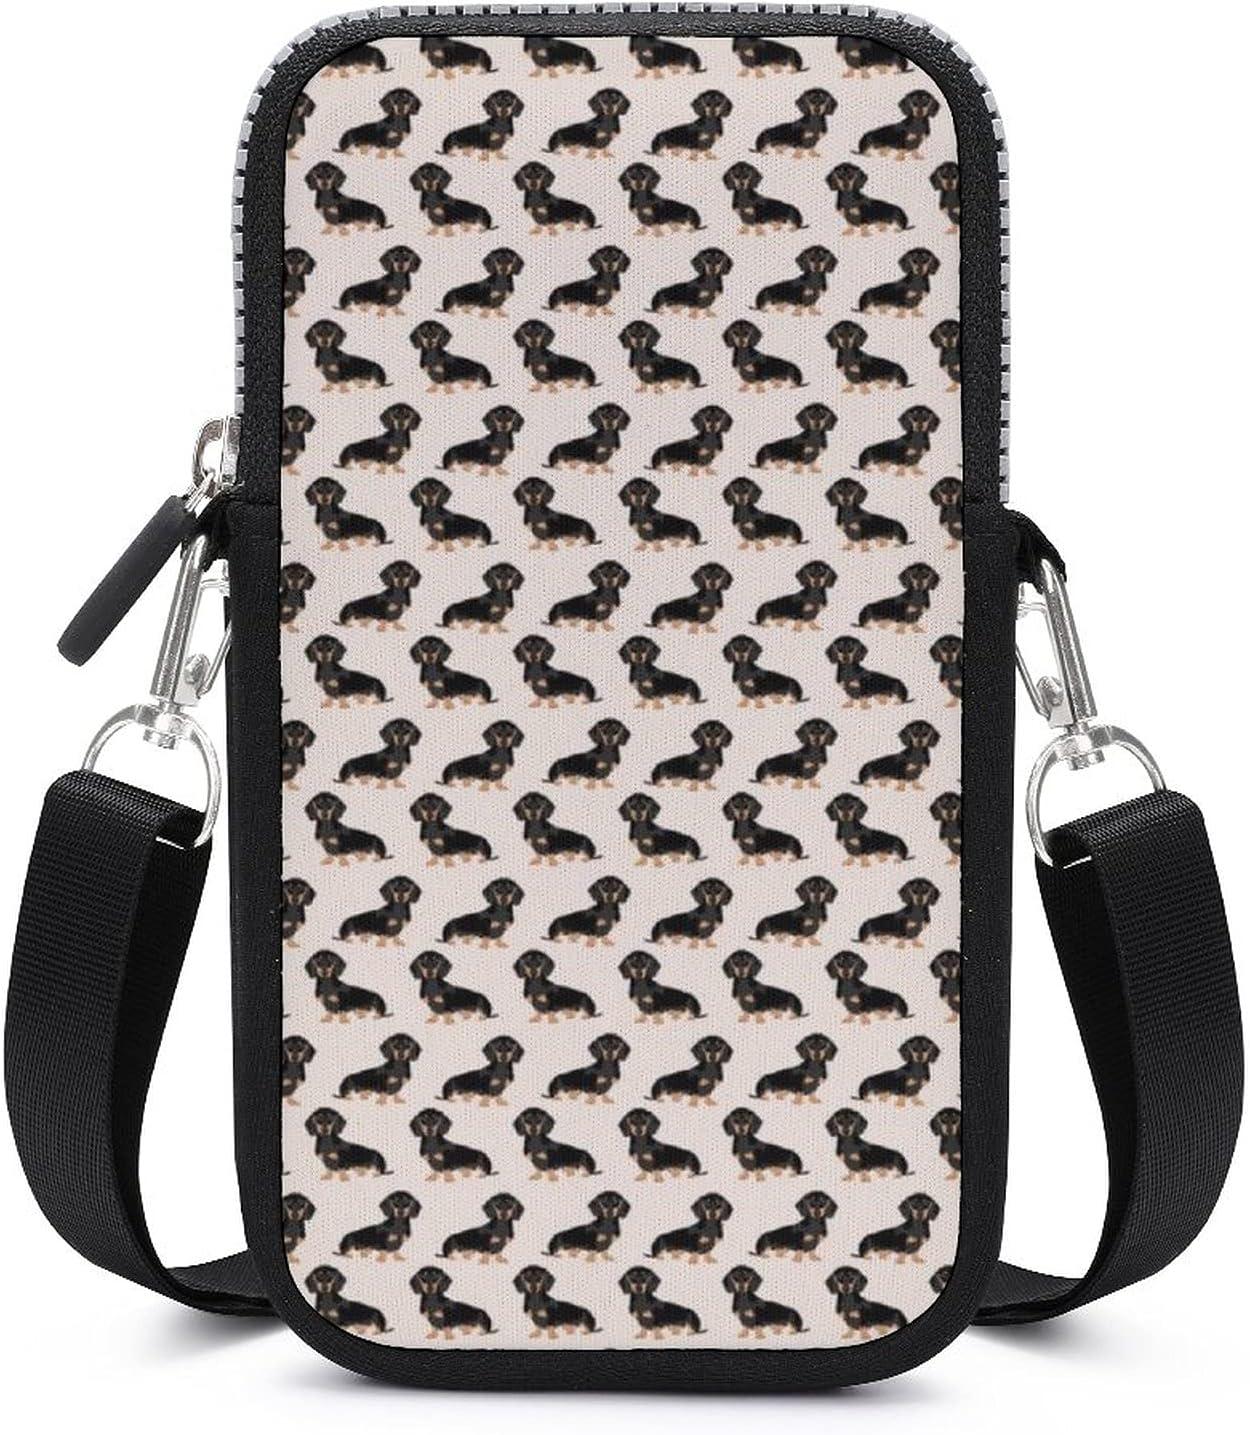 NiYoung Phone Running Multipurpose Shoulder Bag - Passport, Credit Card Adjustable Shoulder Strap, Stash Money Carrier Cute Dachshund Or Doxie Pattern Wristlet Convertible Cross Body Bag